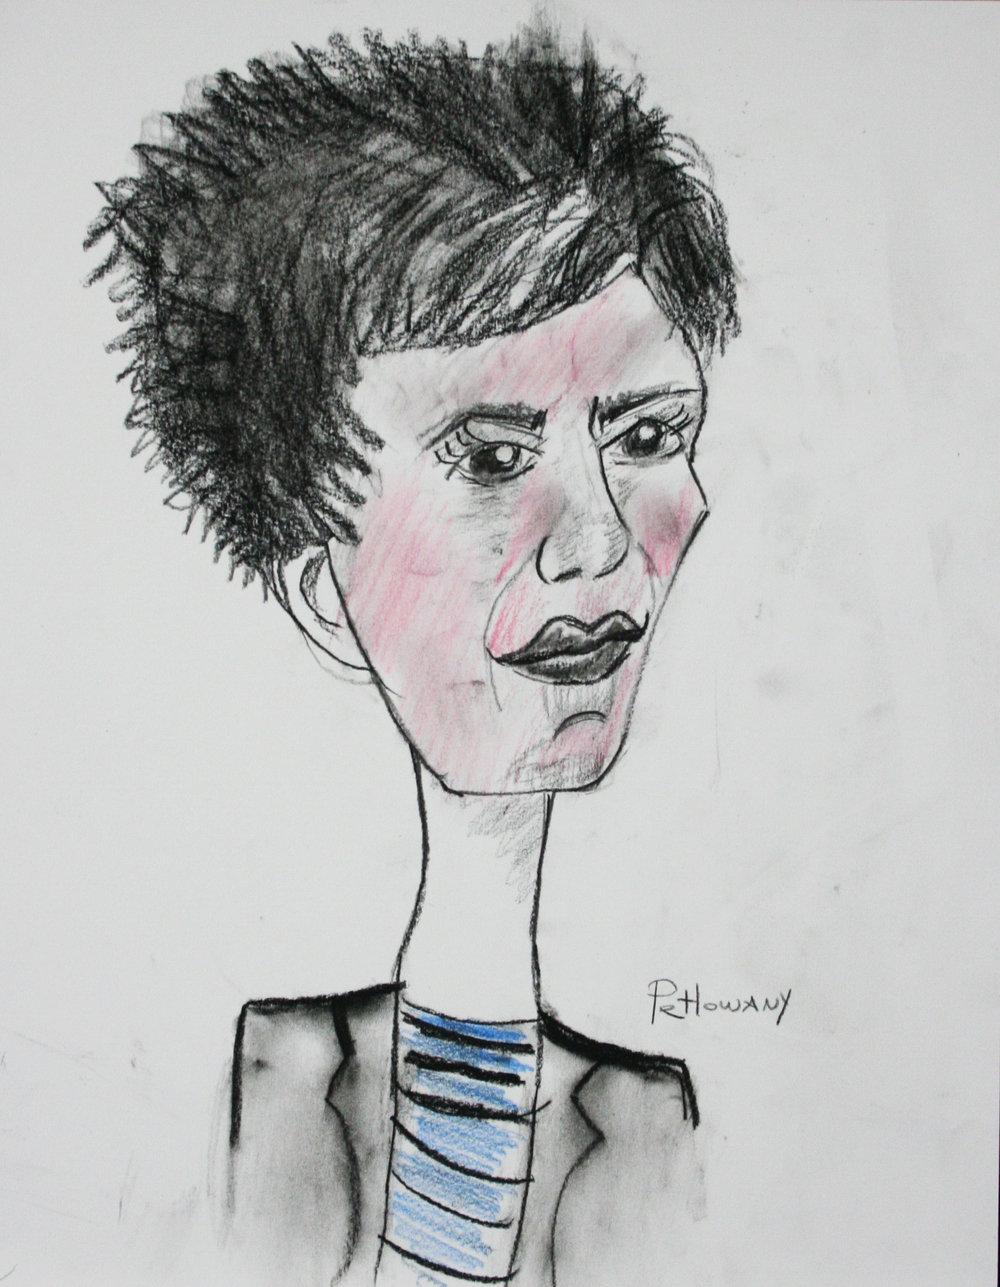 Paula Petlowany did this caricature.